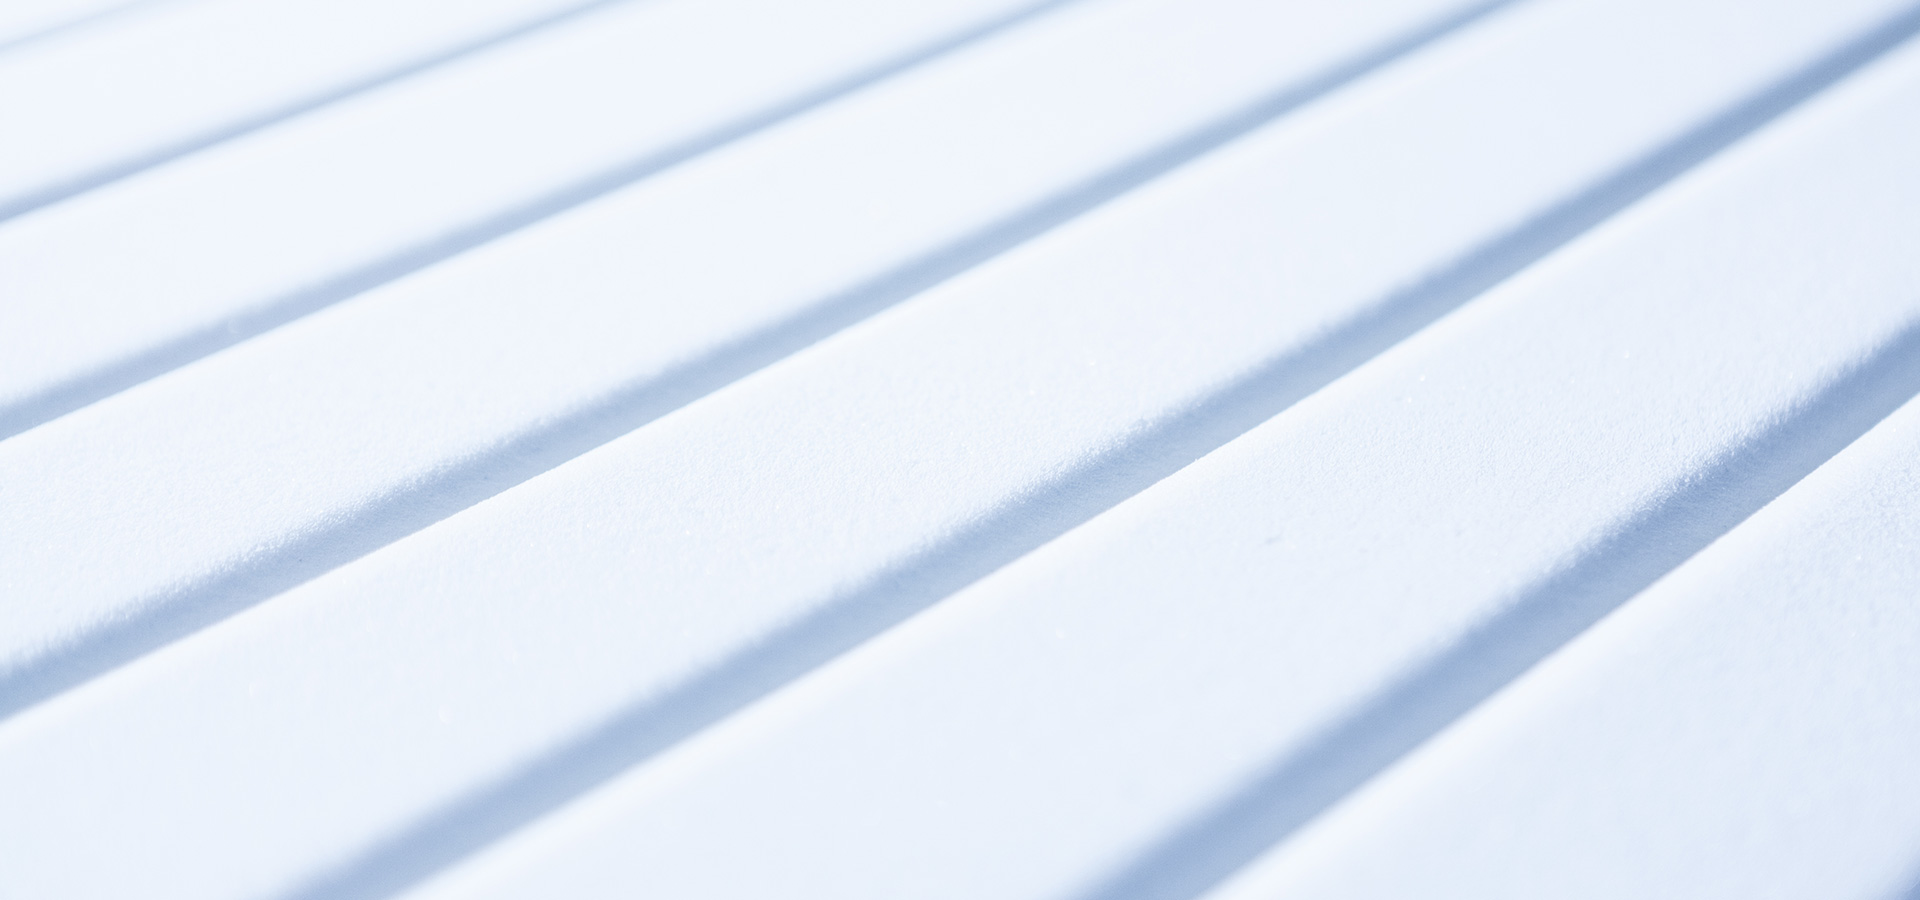 icoa-france_fabricant-de-mousse-polyuréthane-slider-4